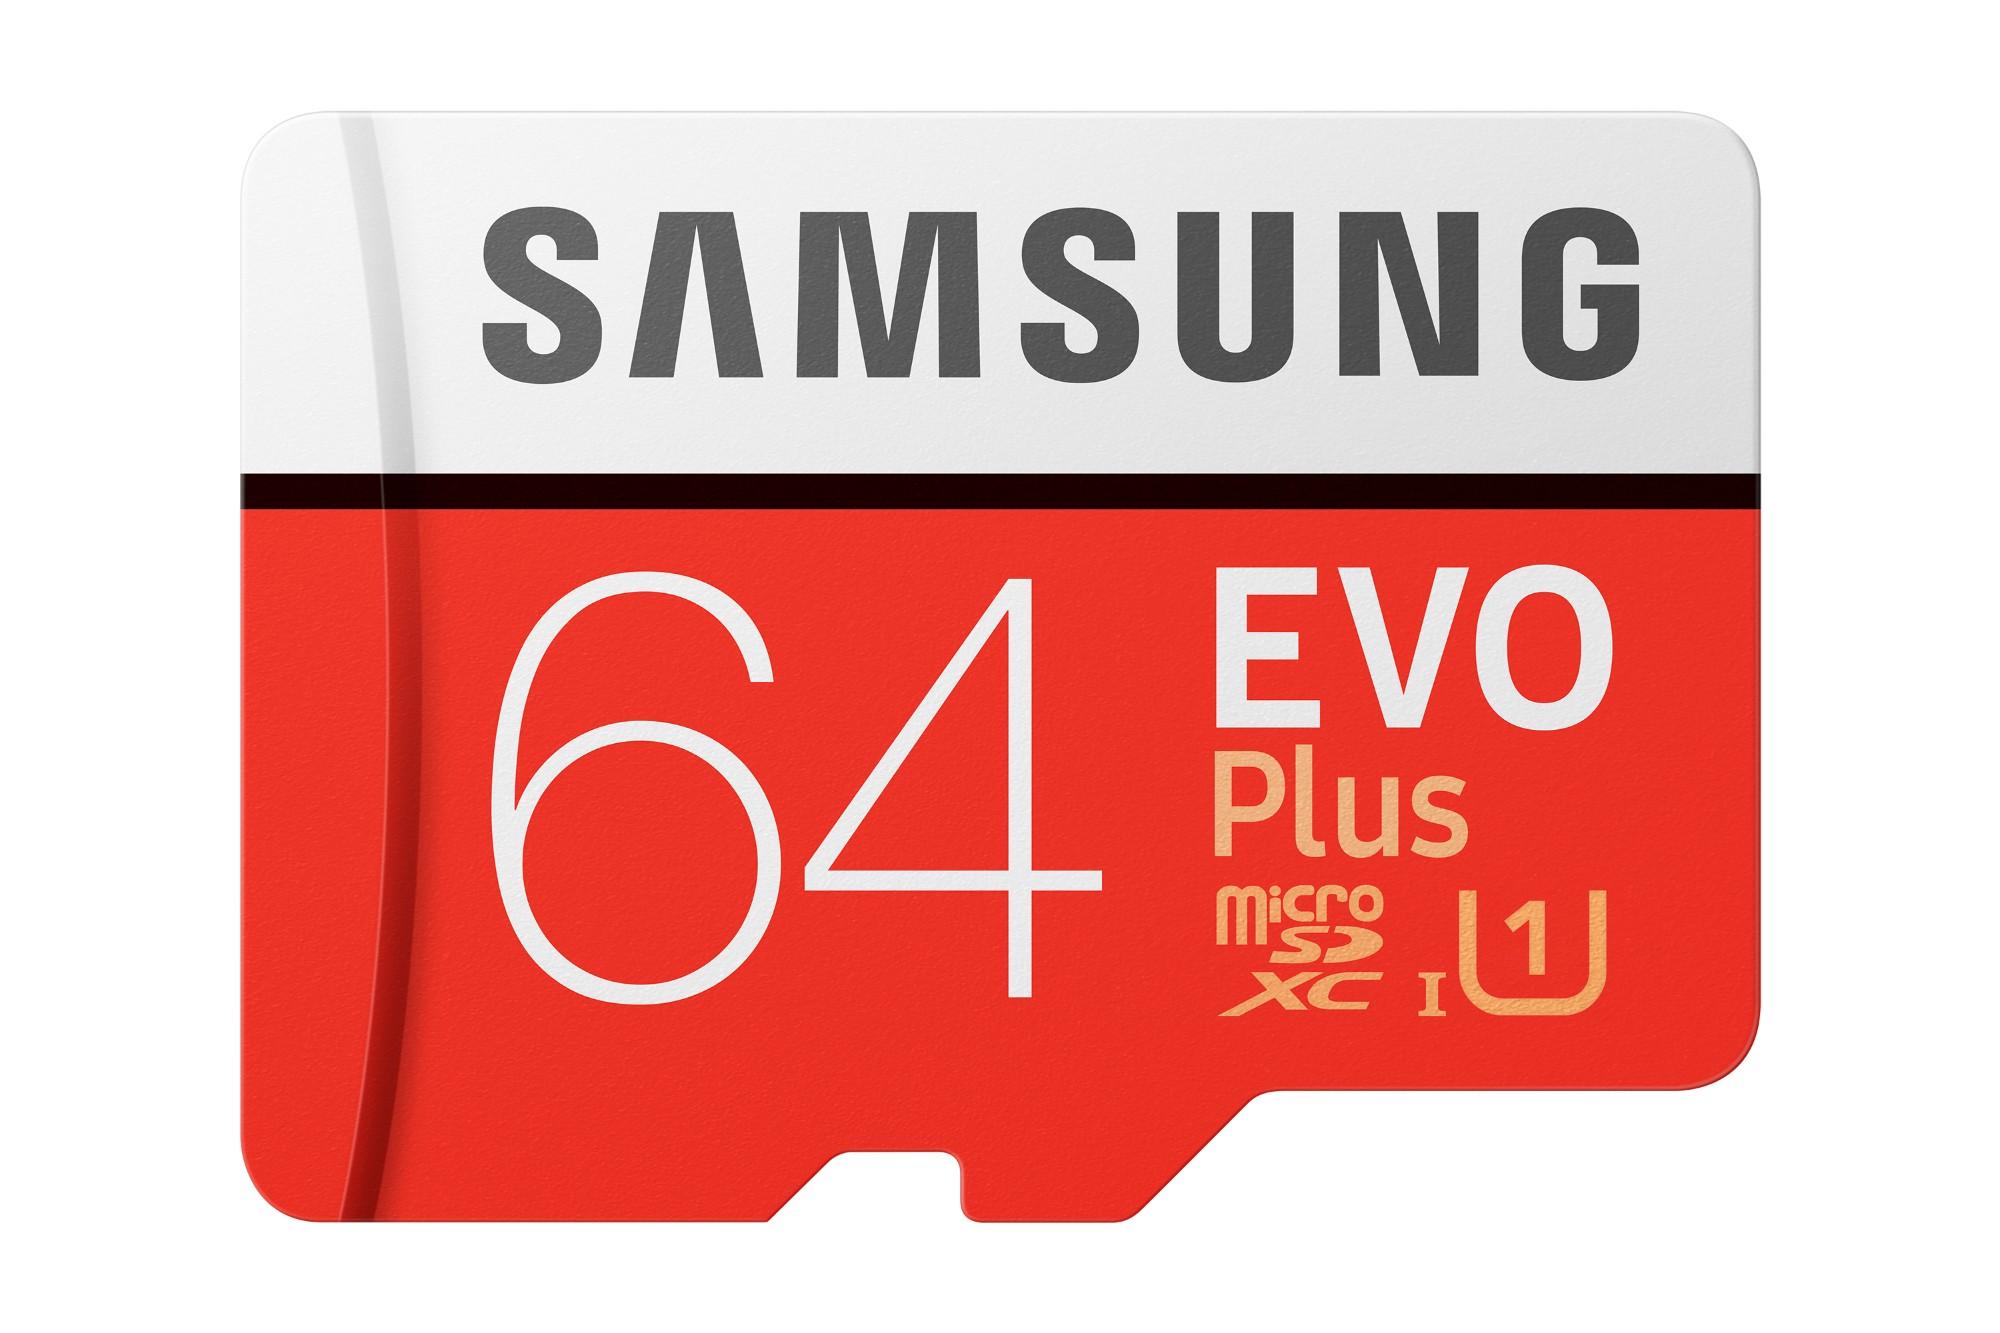 Samsung Evo Plus memoria flash 64 GB MicroSDXC Clase 10 UHS-I